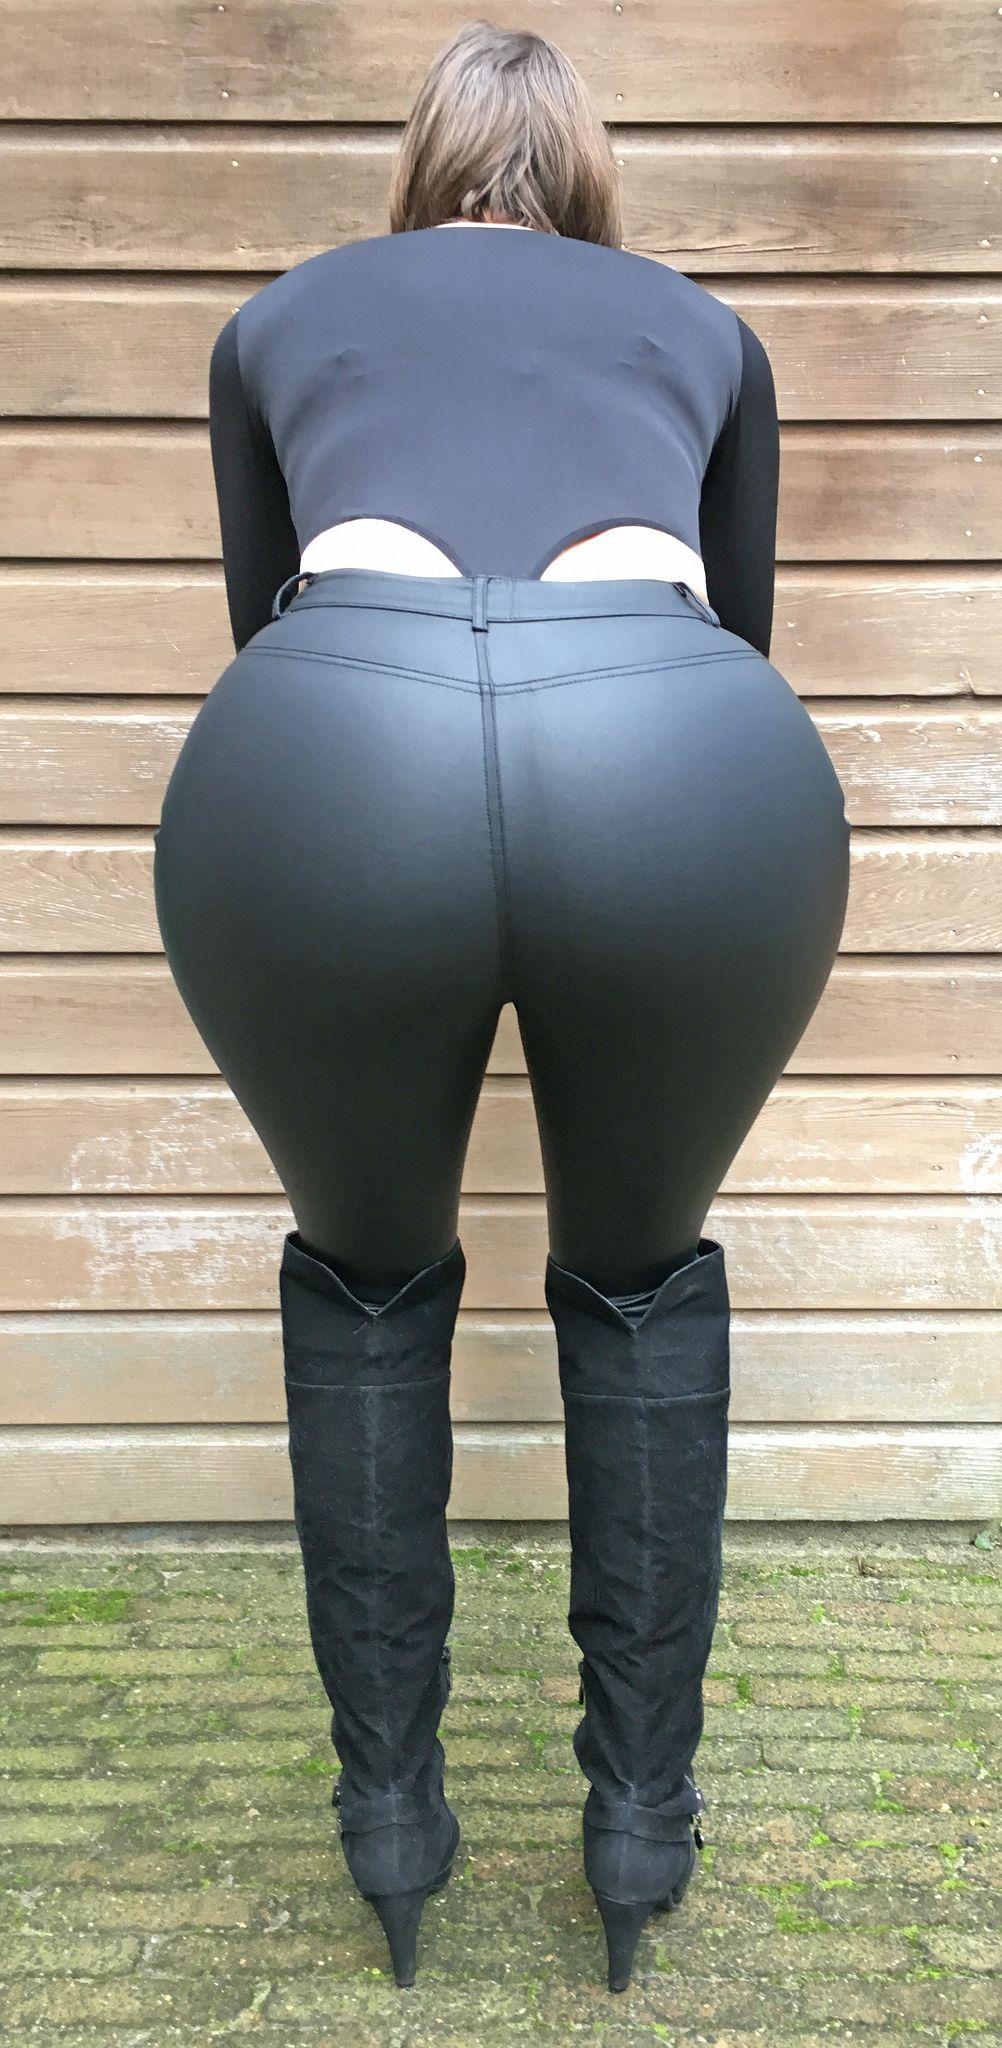 496485c77f78c3 Tabita Fix Yoga Leggings, Black Leggings, Yoga Pants, High Heel Boots, High